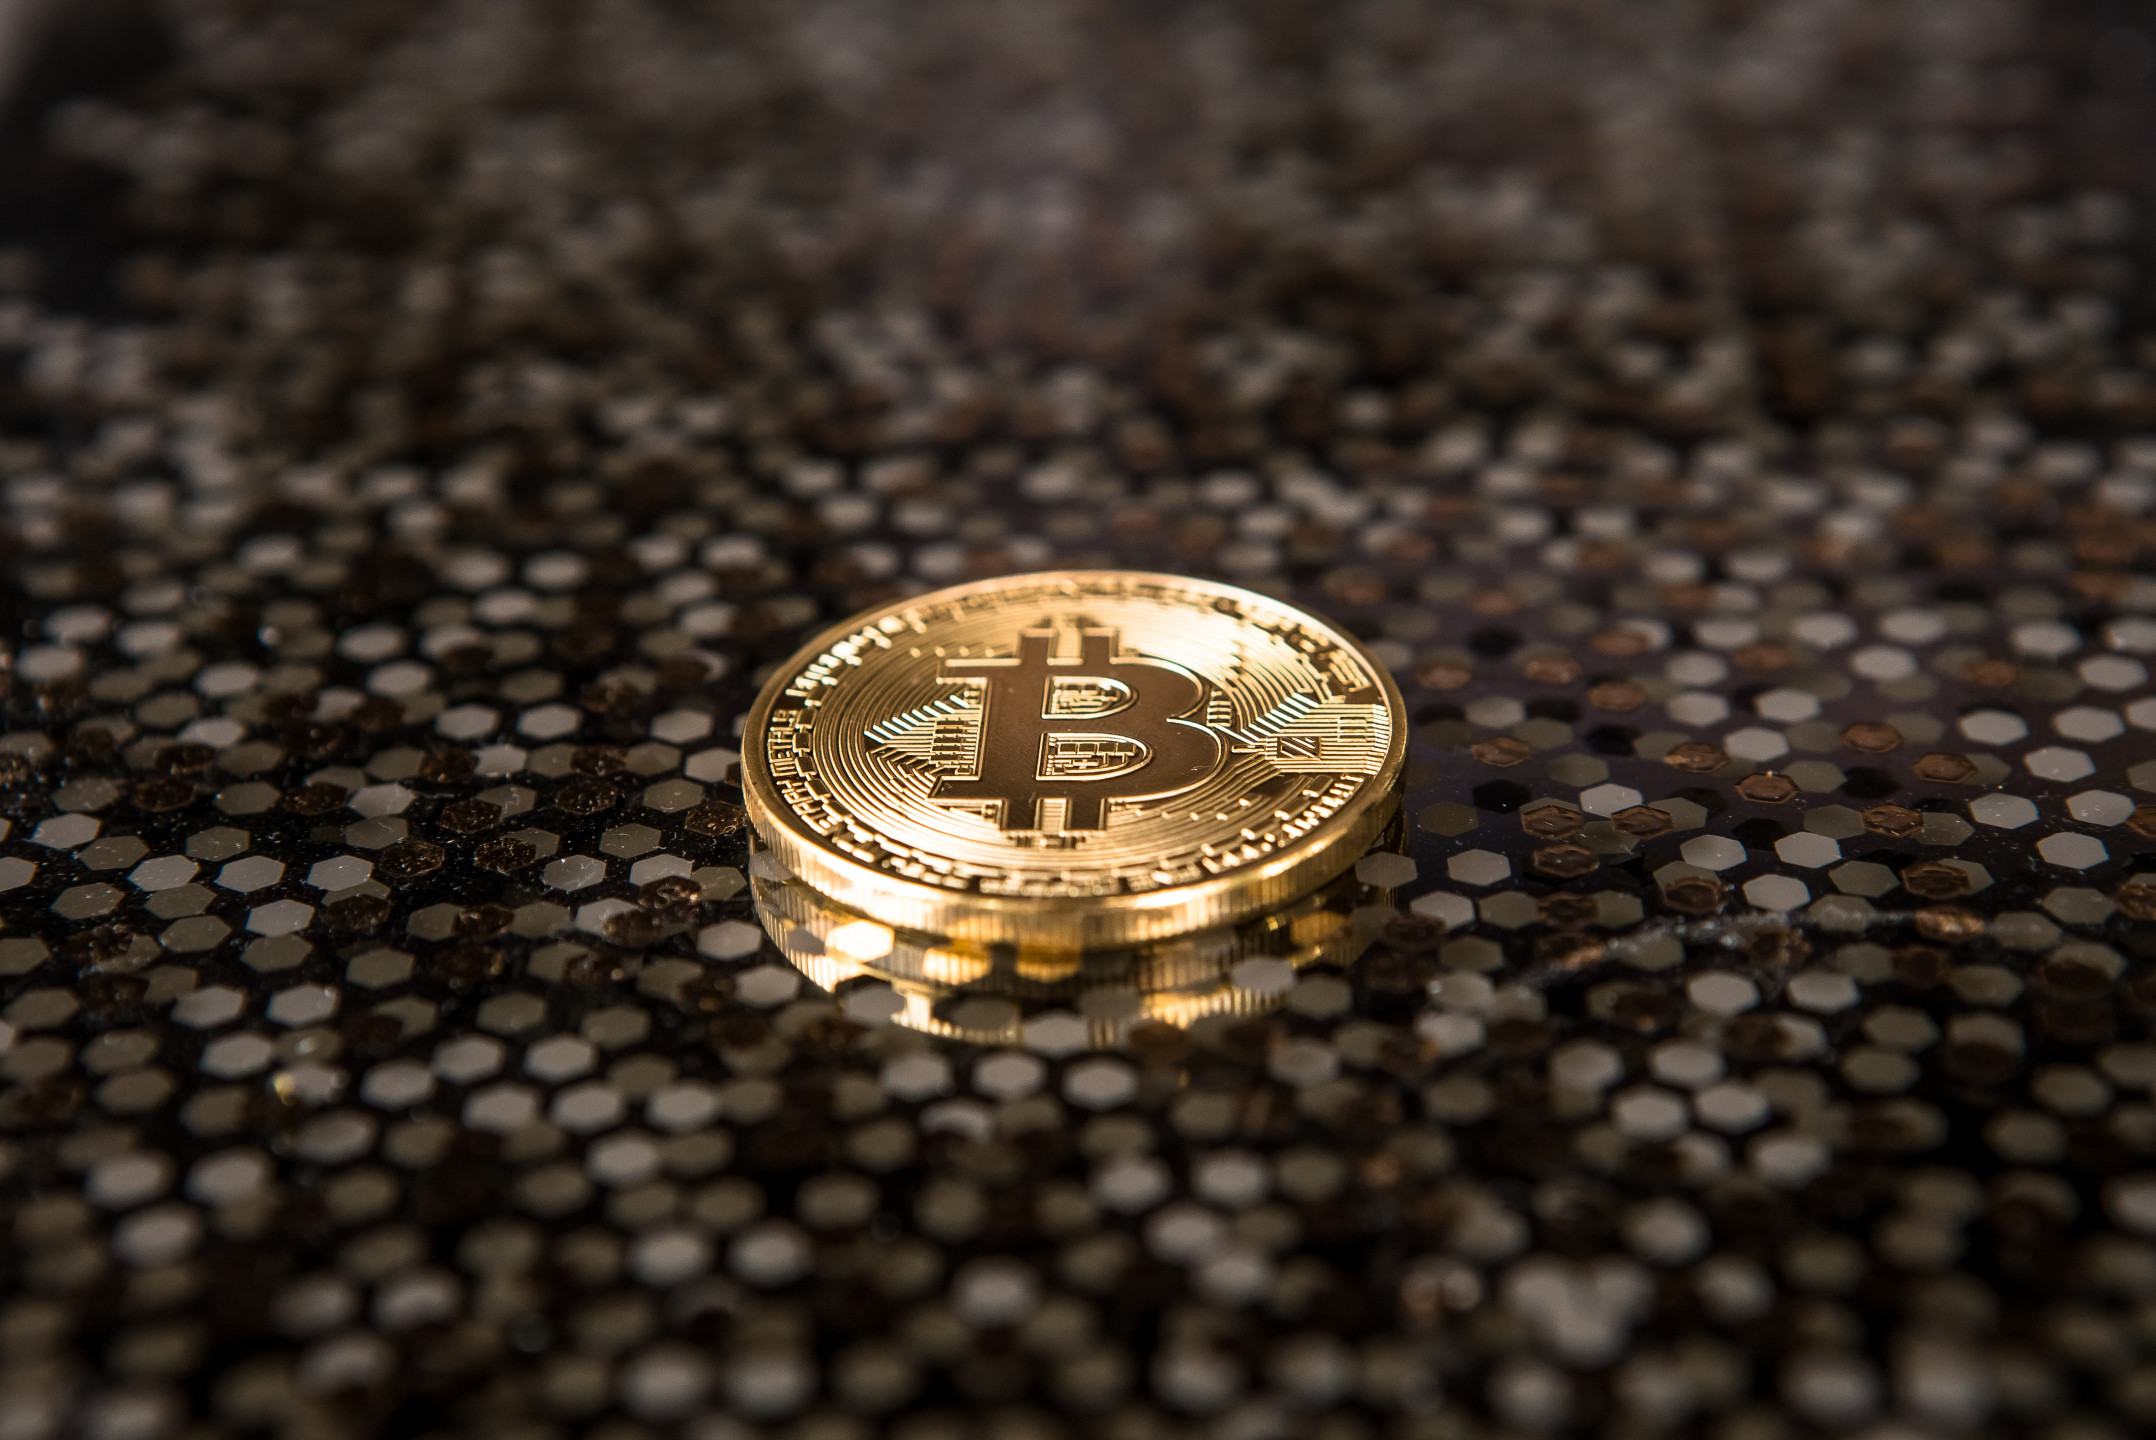 Bitcoin price prediction: is crypto winter really over?